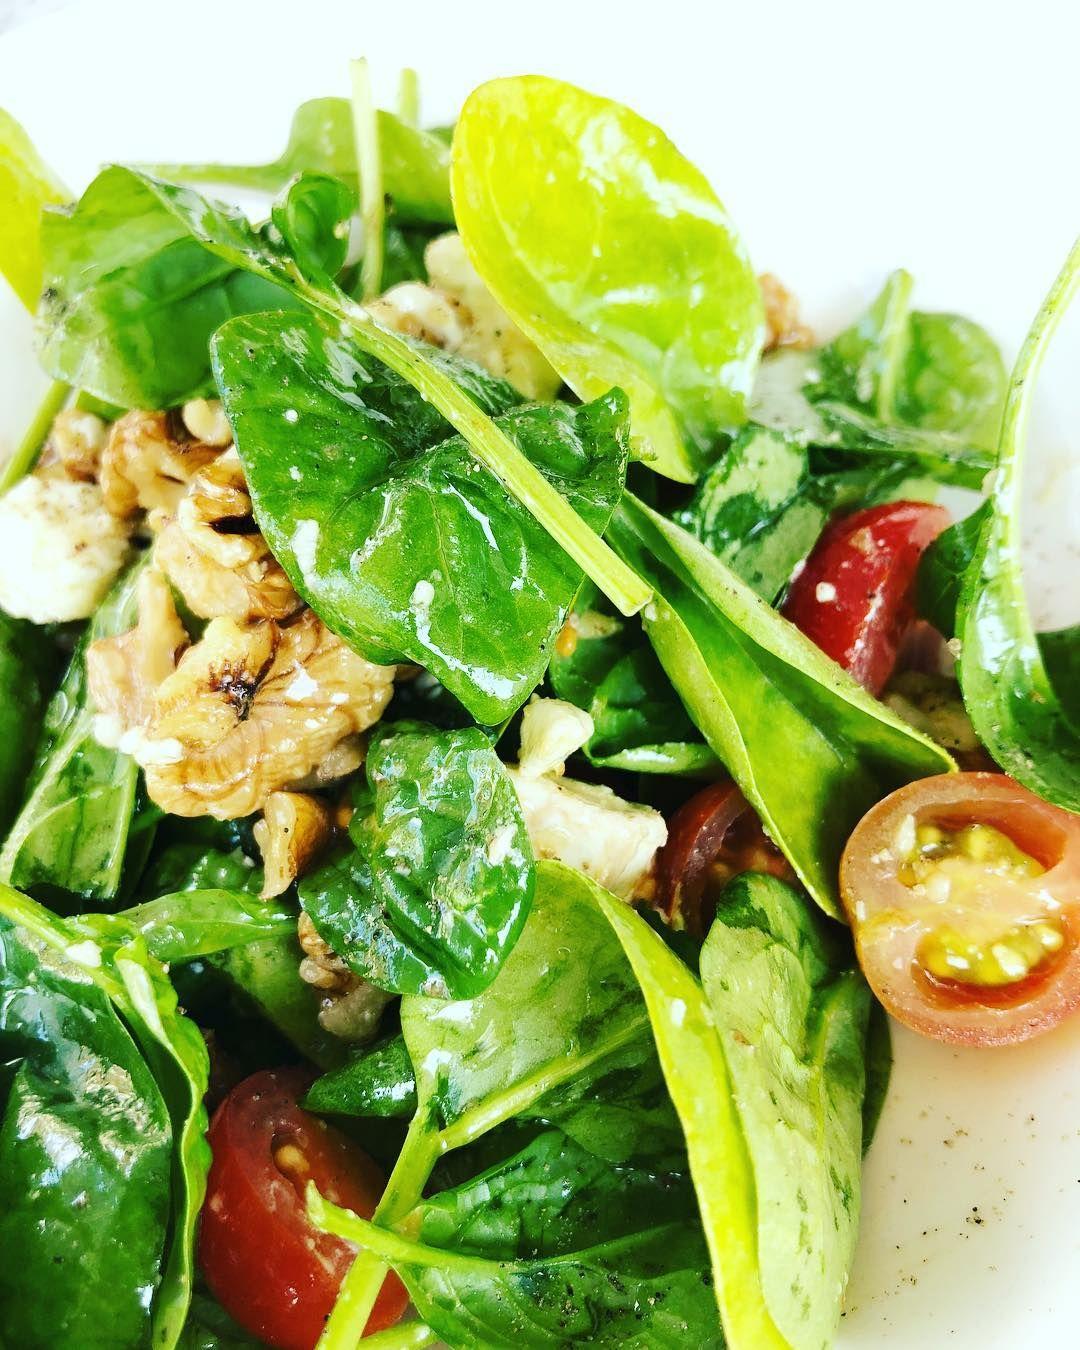 Our summer salad  Baby spinach leaves goats cheese walnuts cherry tomatoes served with a house vinaigrette.  #salad #sumner #newmenu #healthy #glutenfree #vegetarian #stvilla #stalbans #food #alacarte #lunch #dinner #stalbans #hertfordshire #mediteranean #foodstagram #eatwithyoureyes #independent #restaurant #cocktailbar